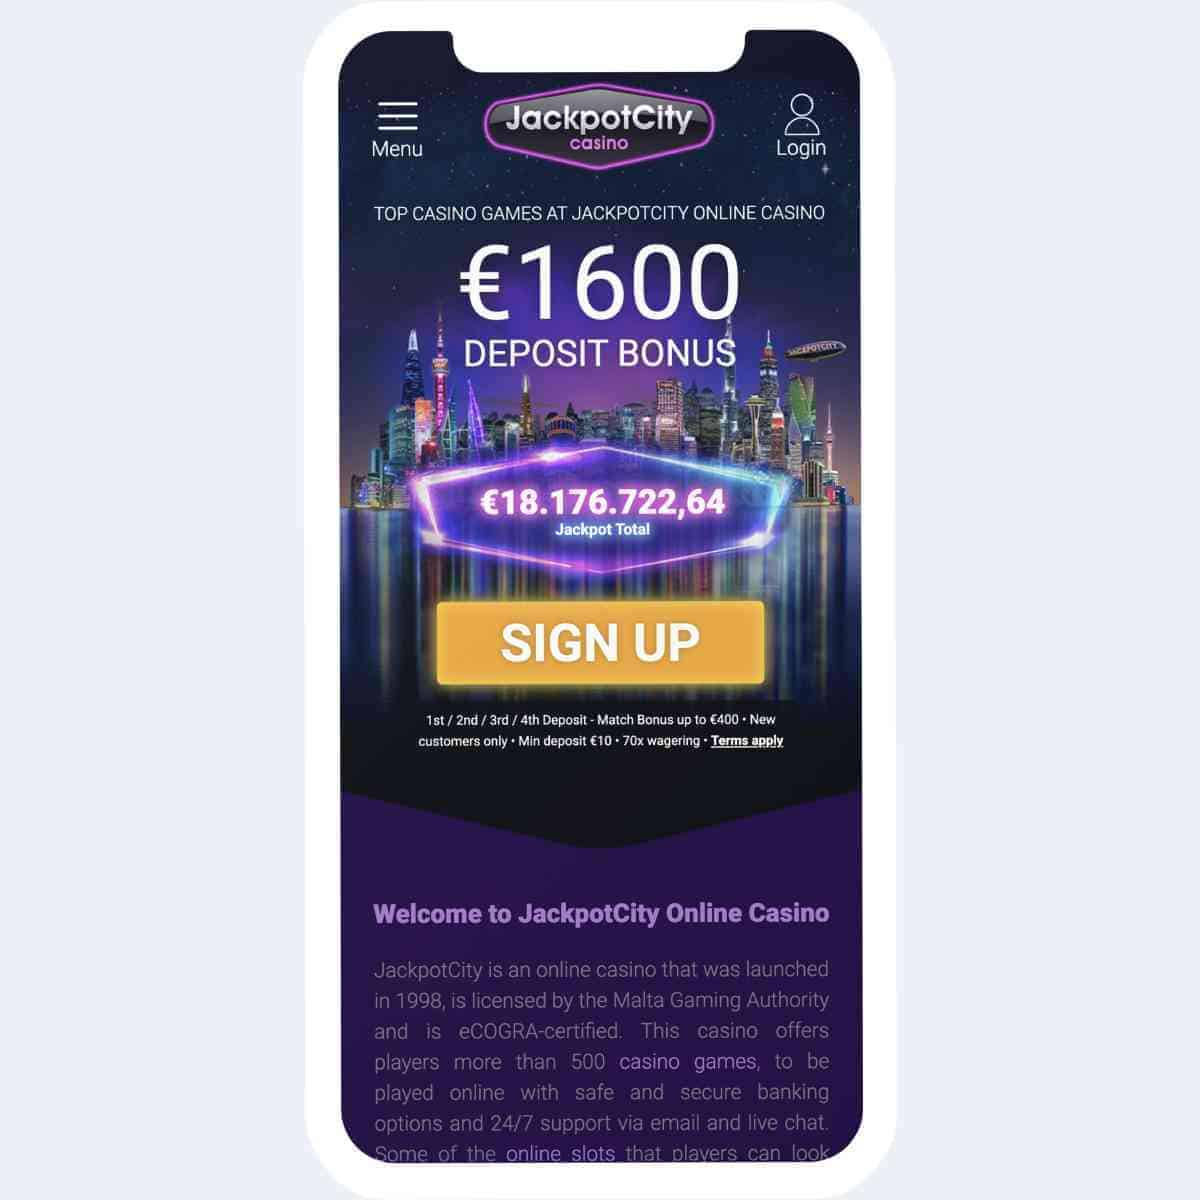 jackpotcity bonus mobile